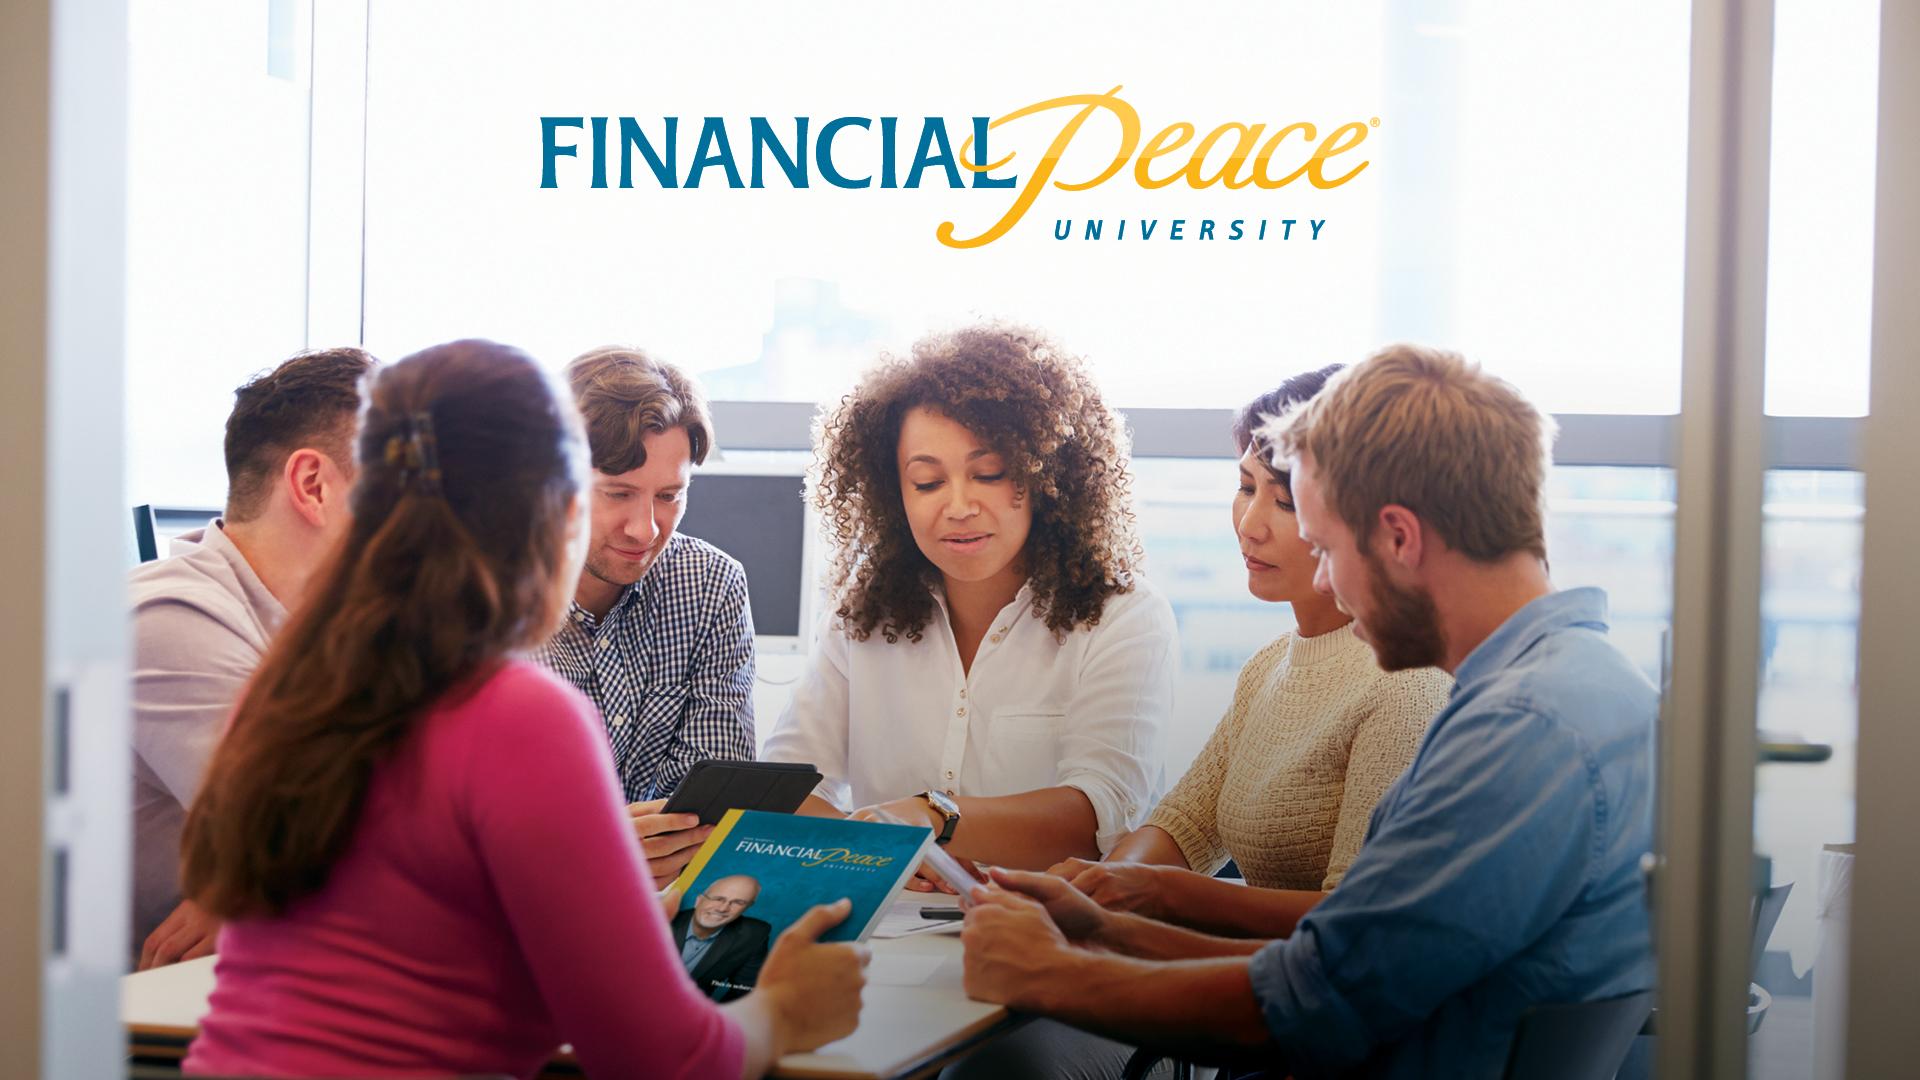 financial-peace-slide-classroom (1).jpg